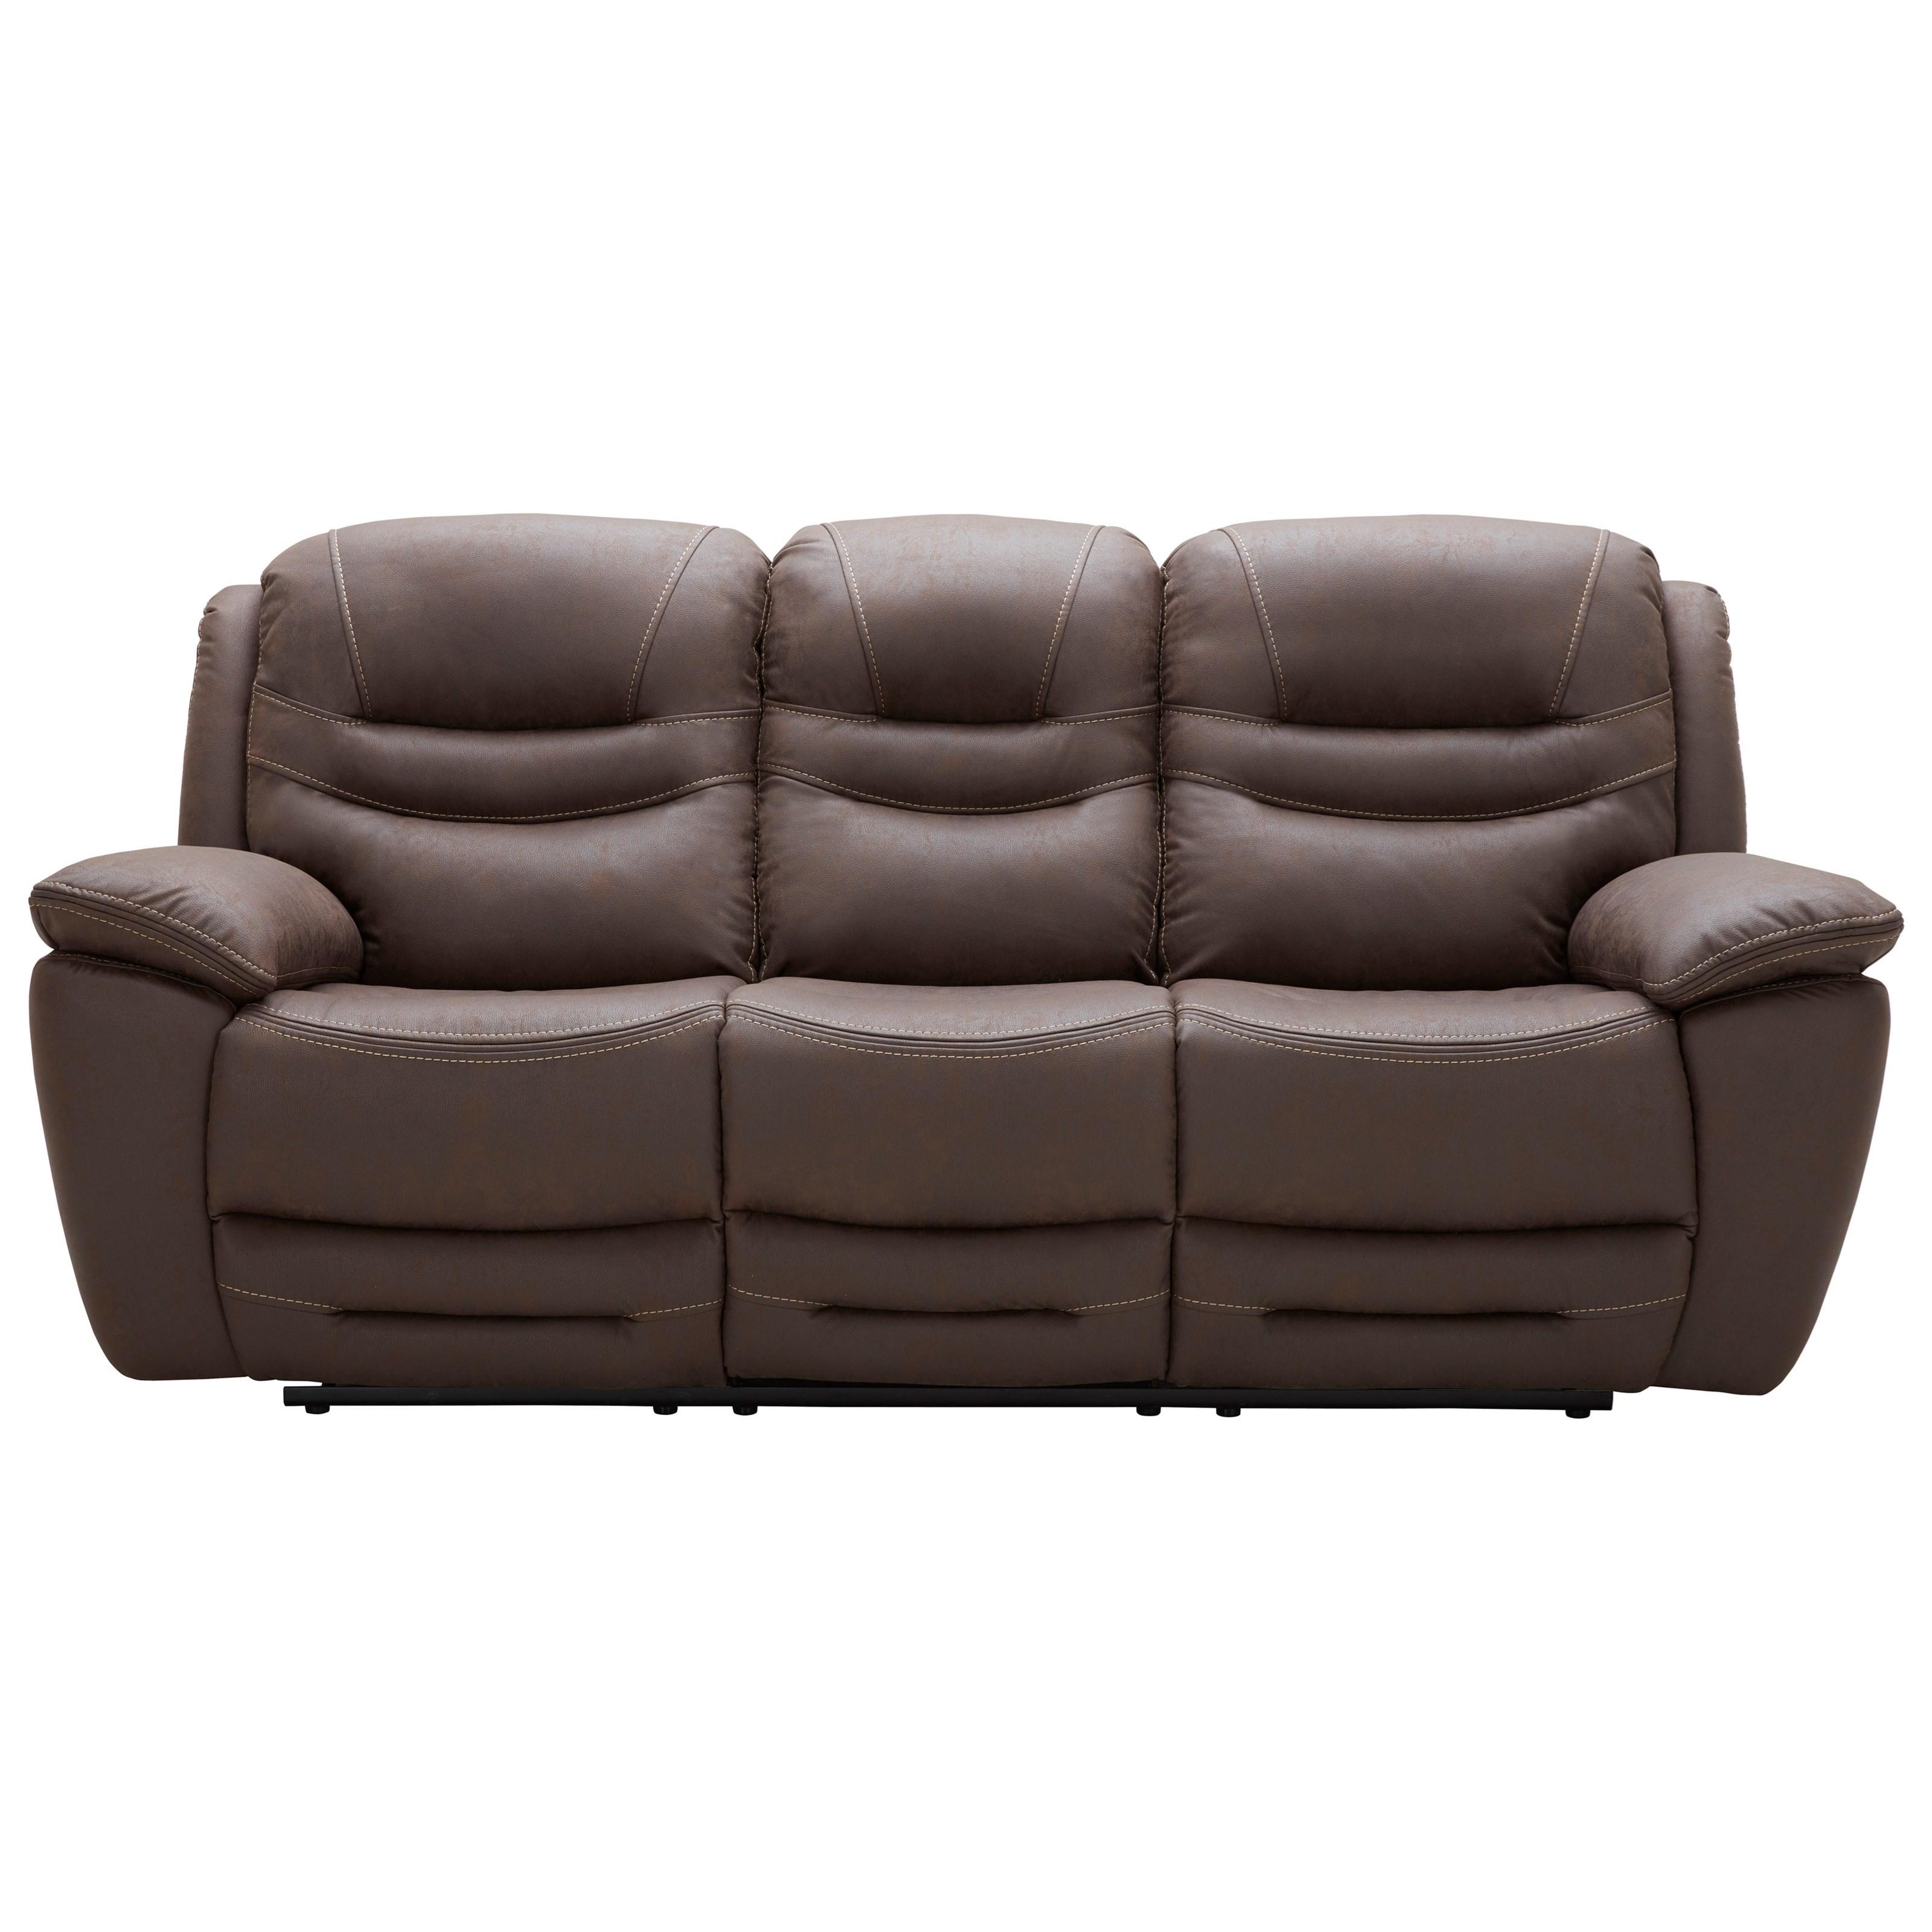 Shaffer Reclining Sofa by K.C. at Walker's Furniture